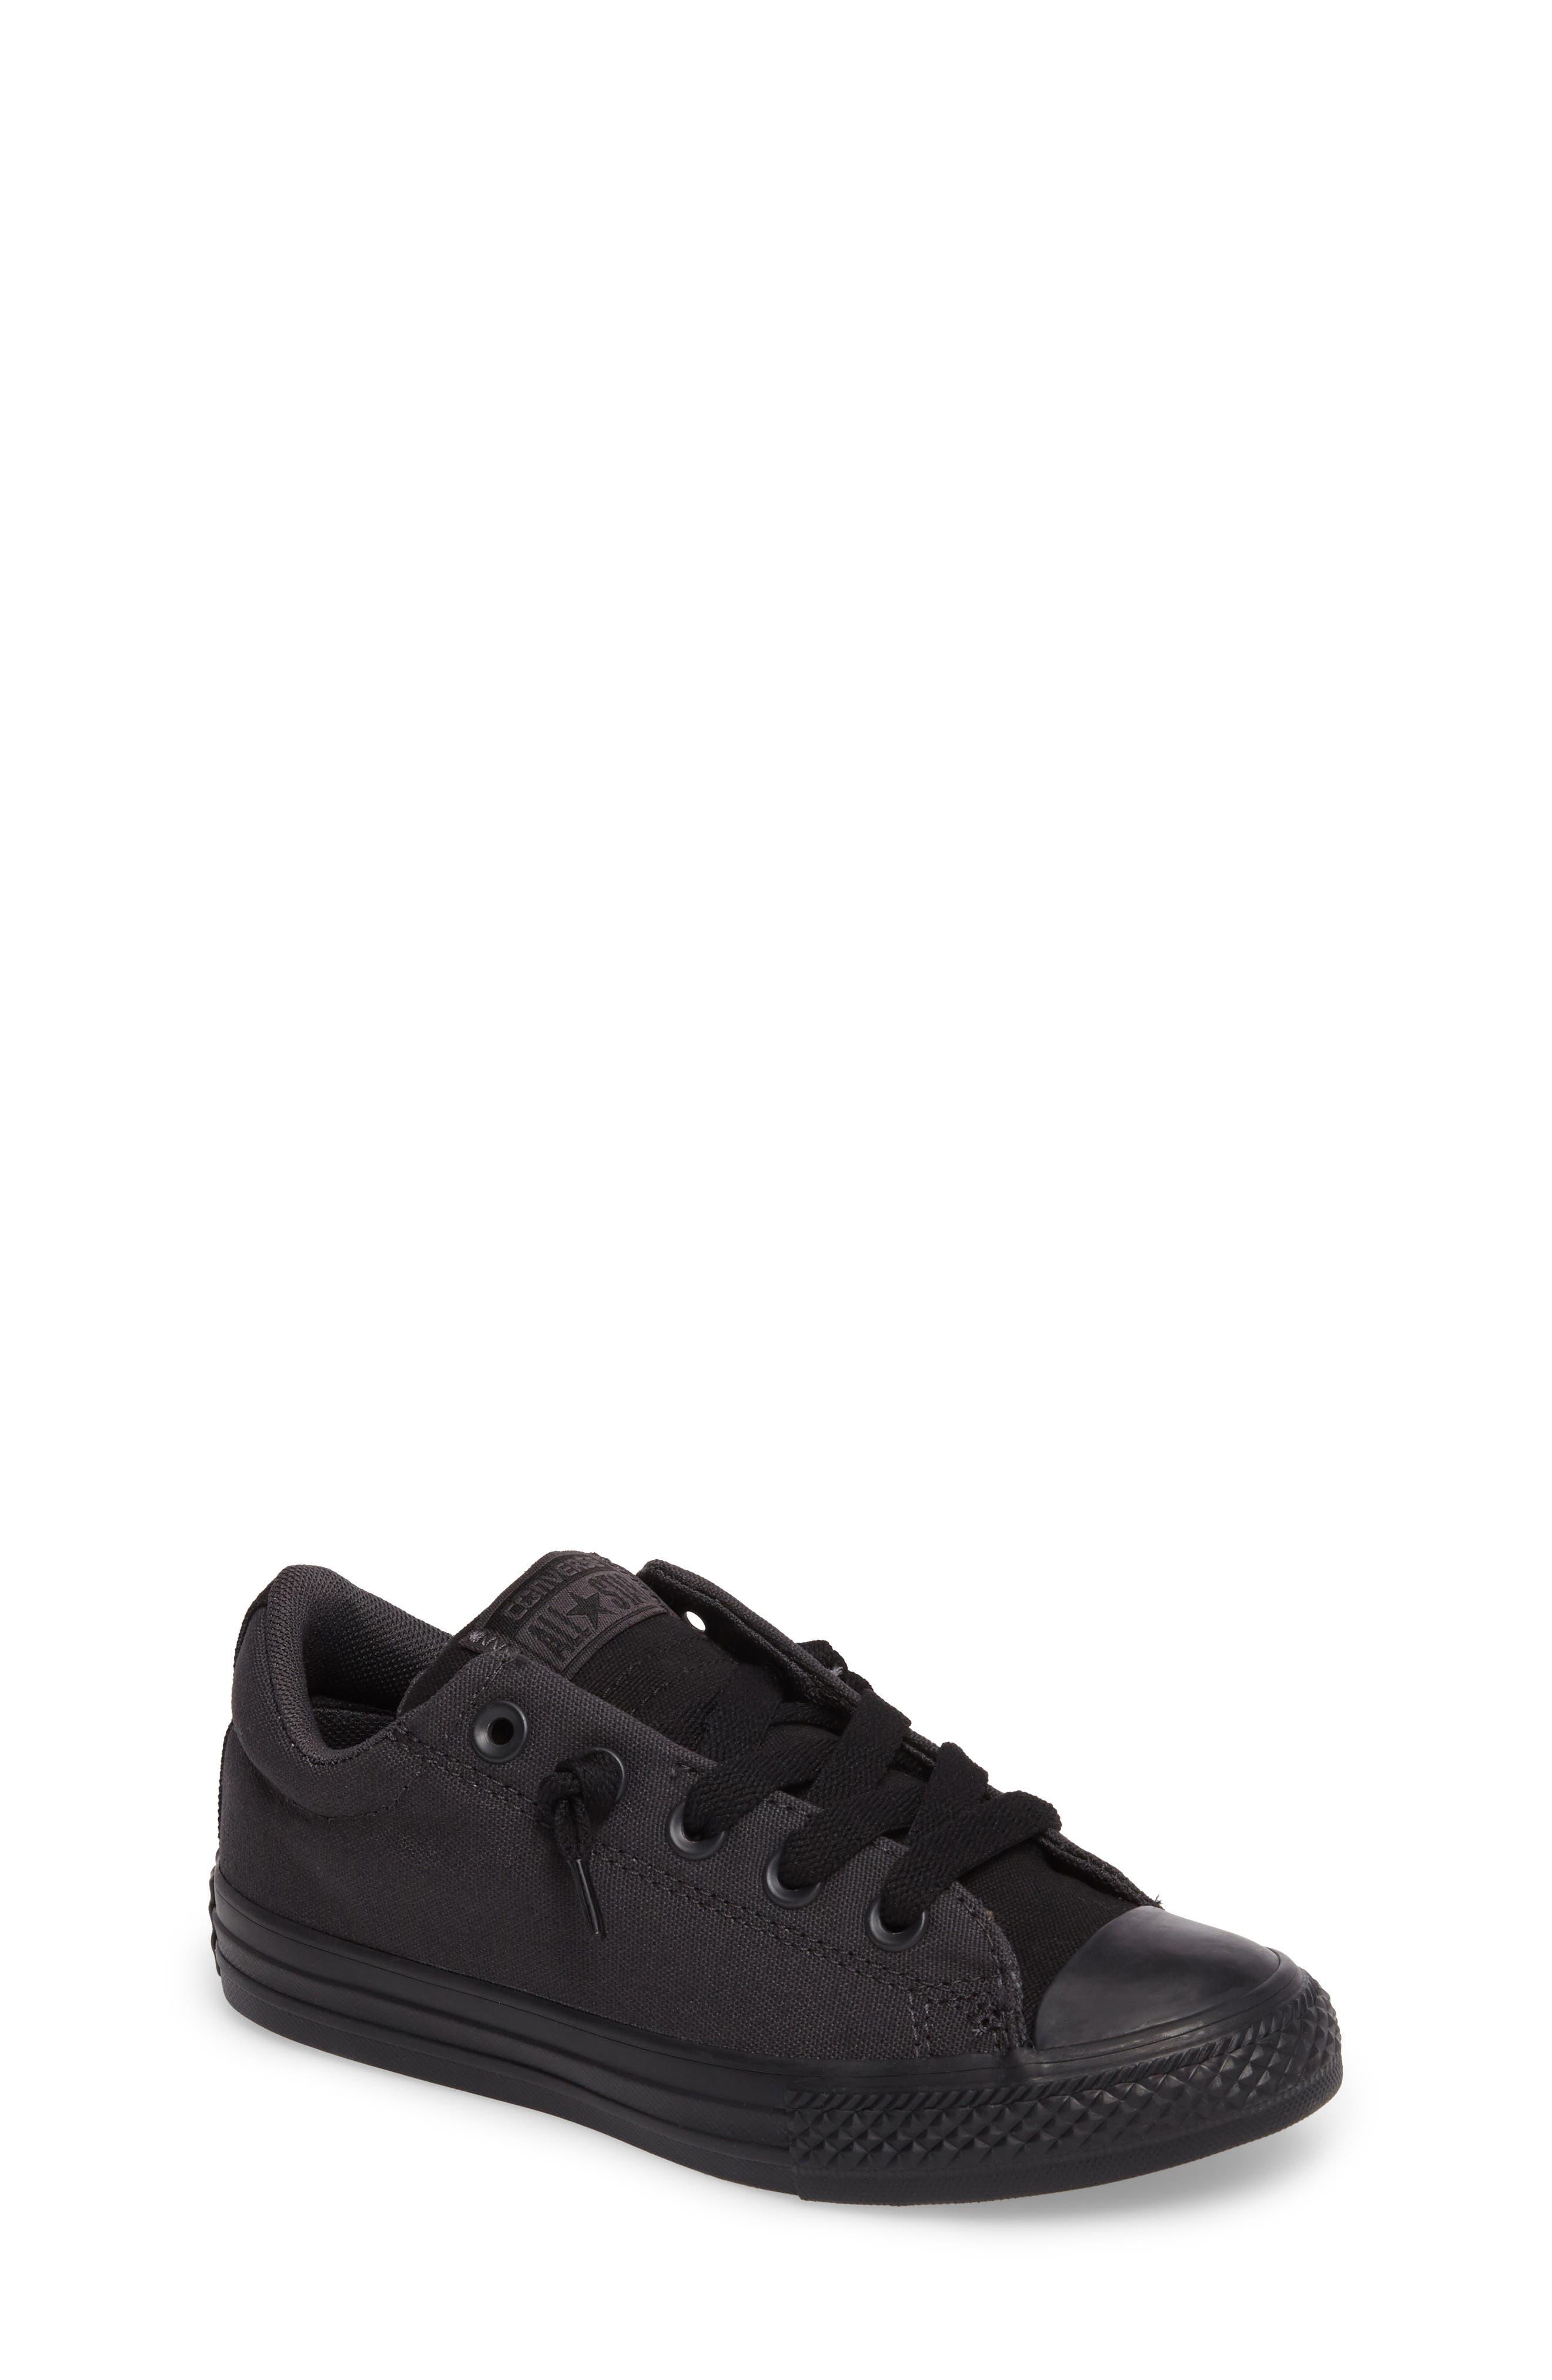 Converse All Star® Street Slip Low Top Sneaker (Toddler, Little Kid & Big Kid)